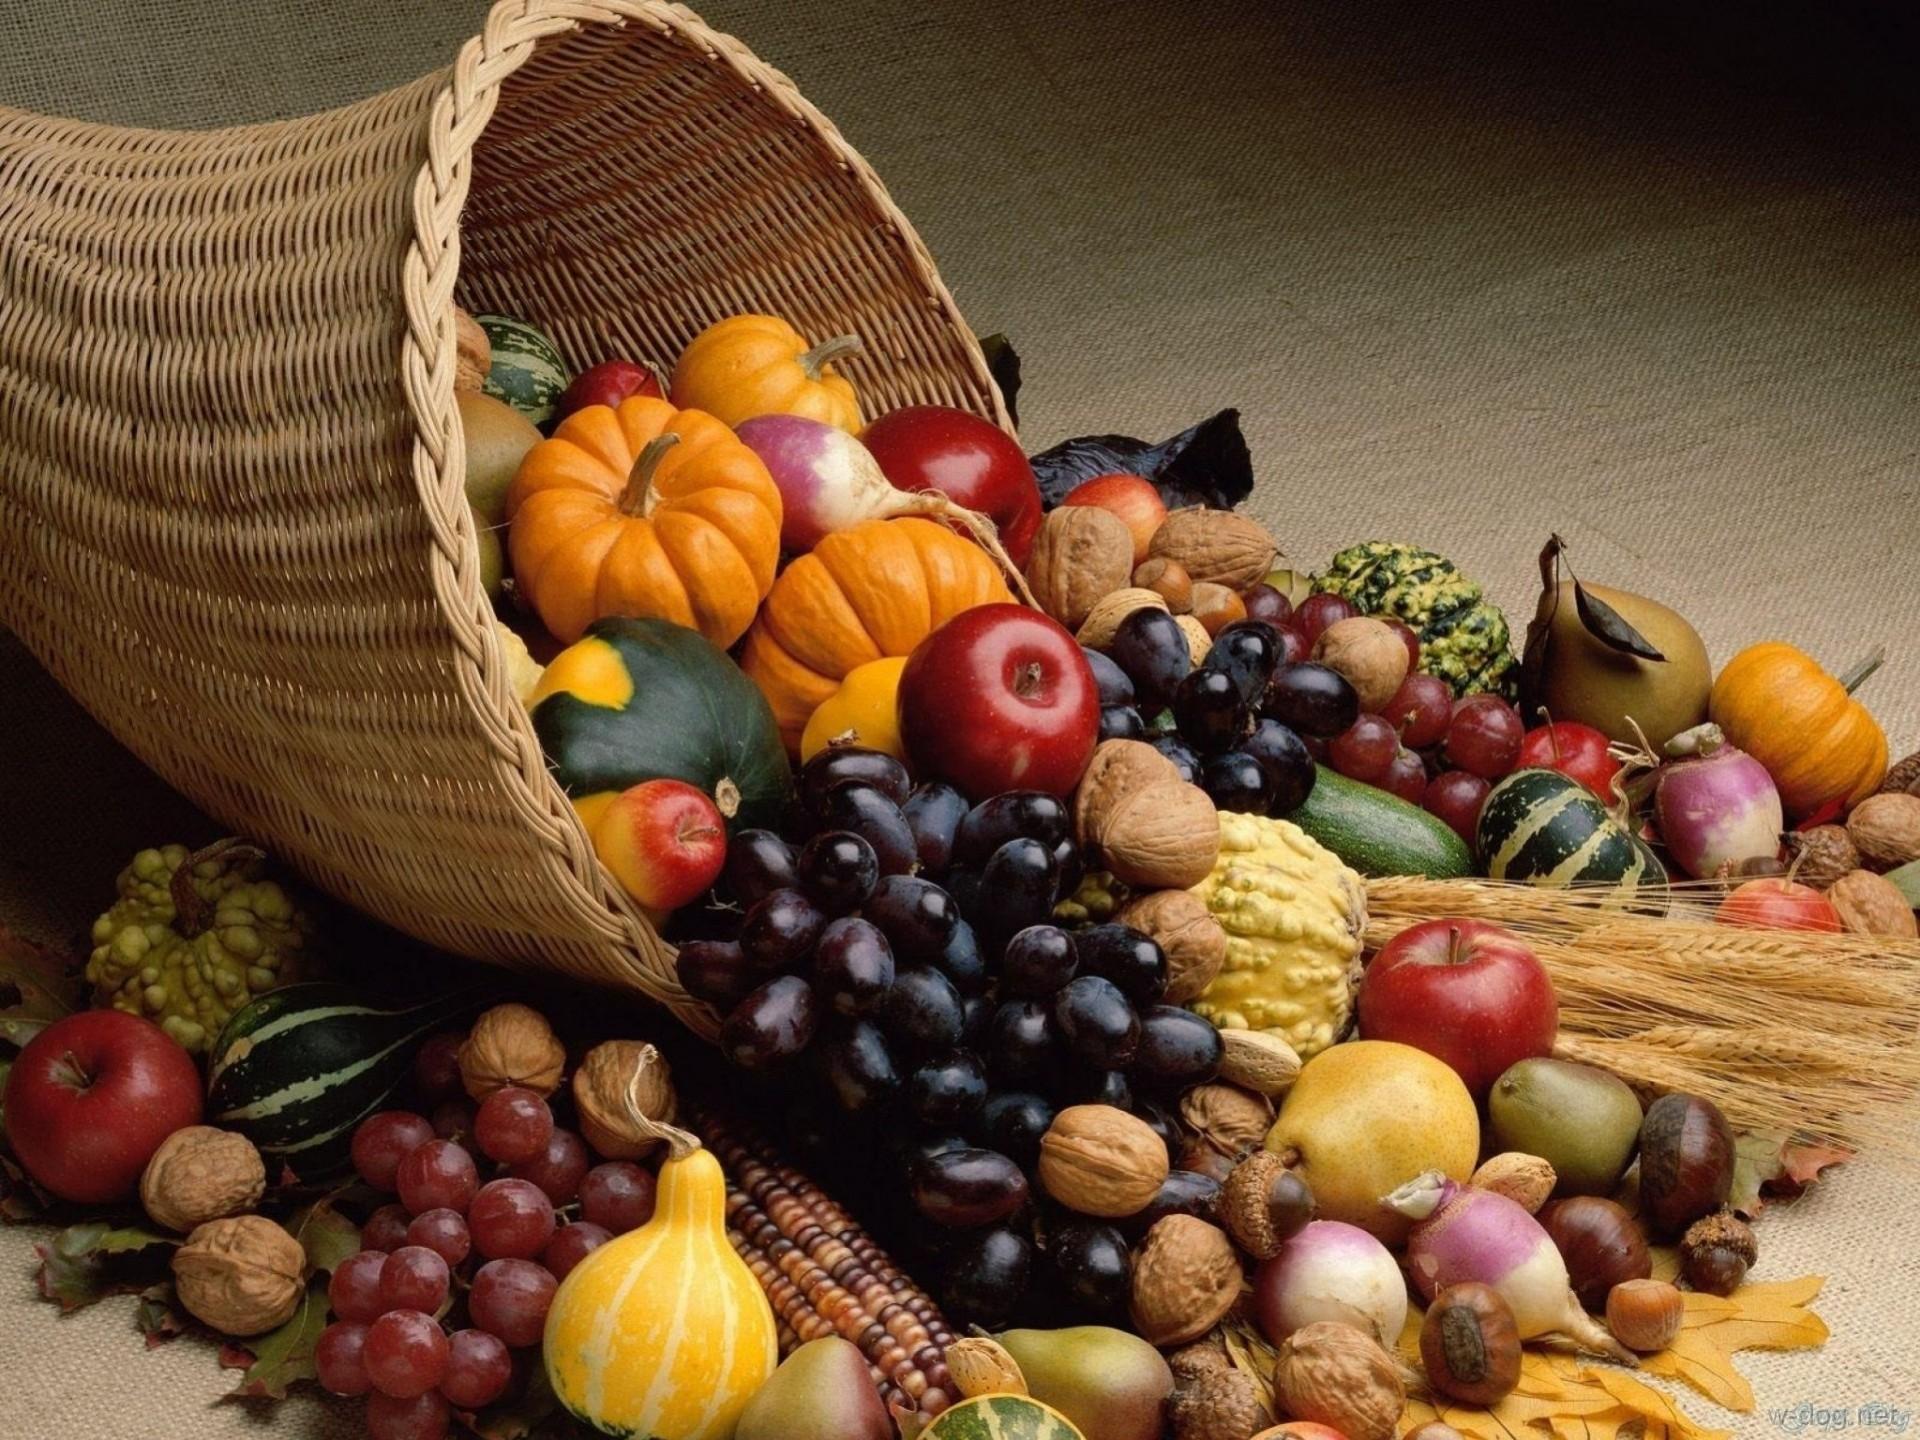 еда фрукты груша виноград корзина food fruit pear grapes basket бесплатно